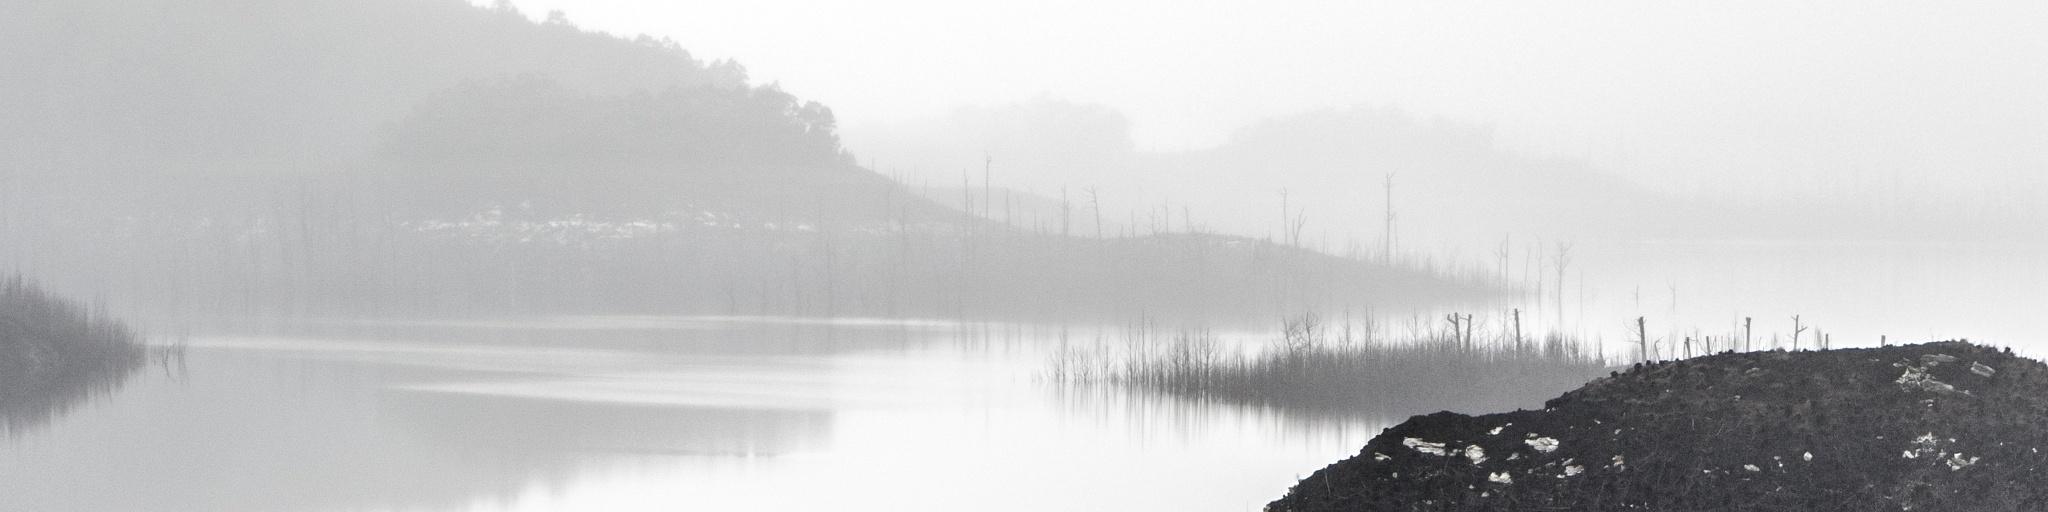 Foggy morning by Anastasia